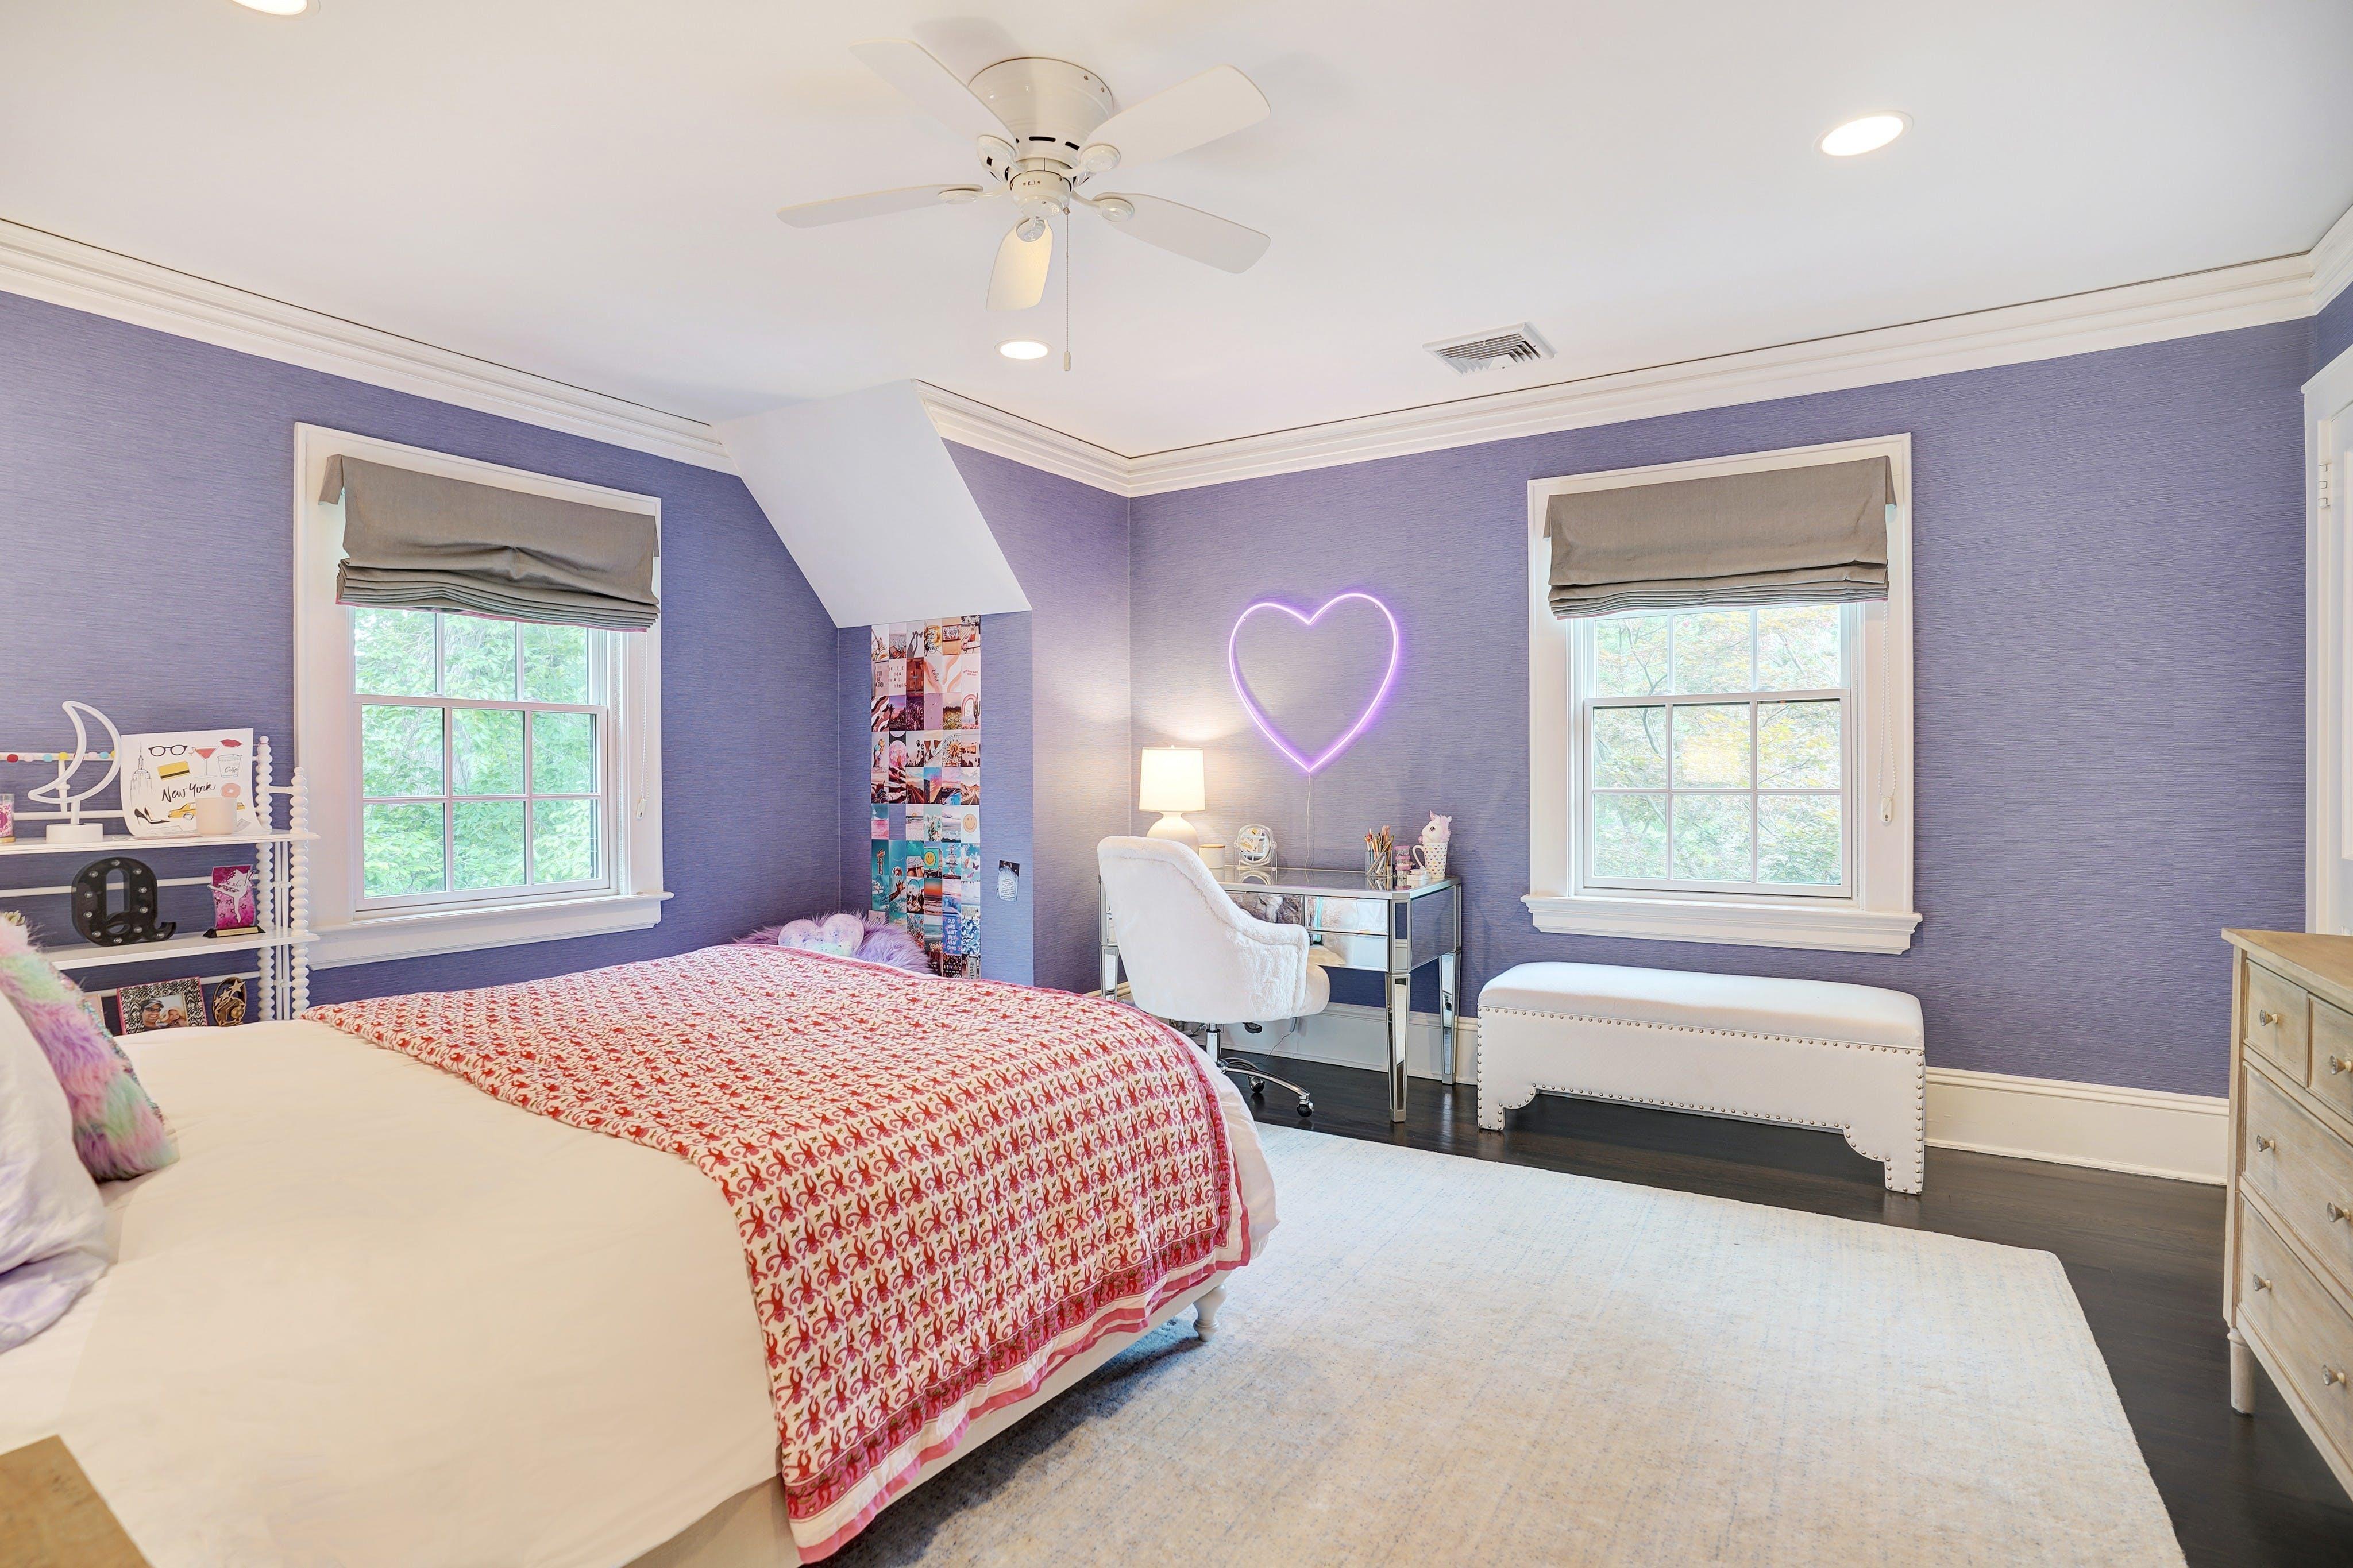 34 Dogwood Drive Bedroom